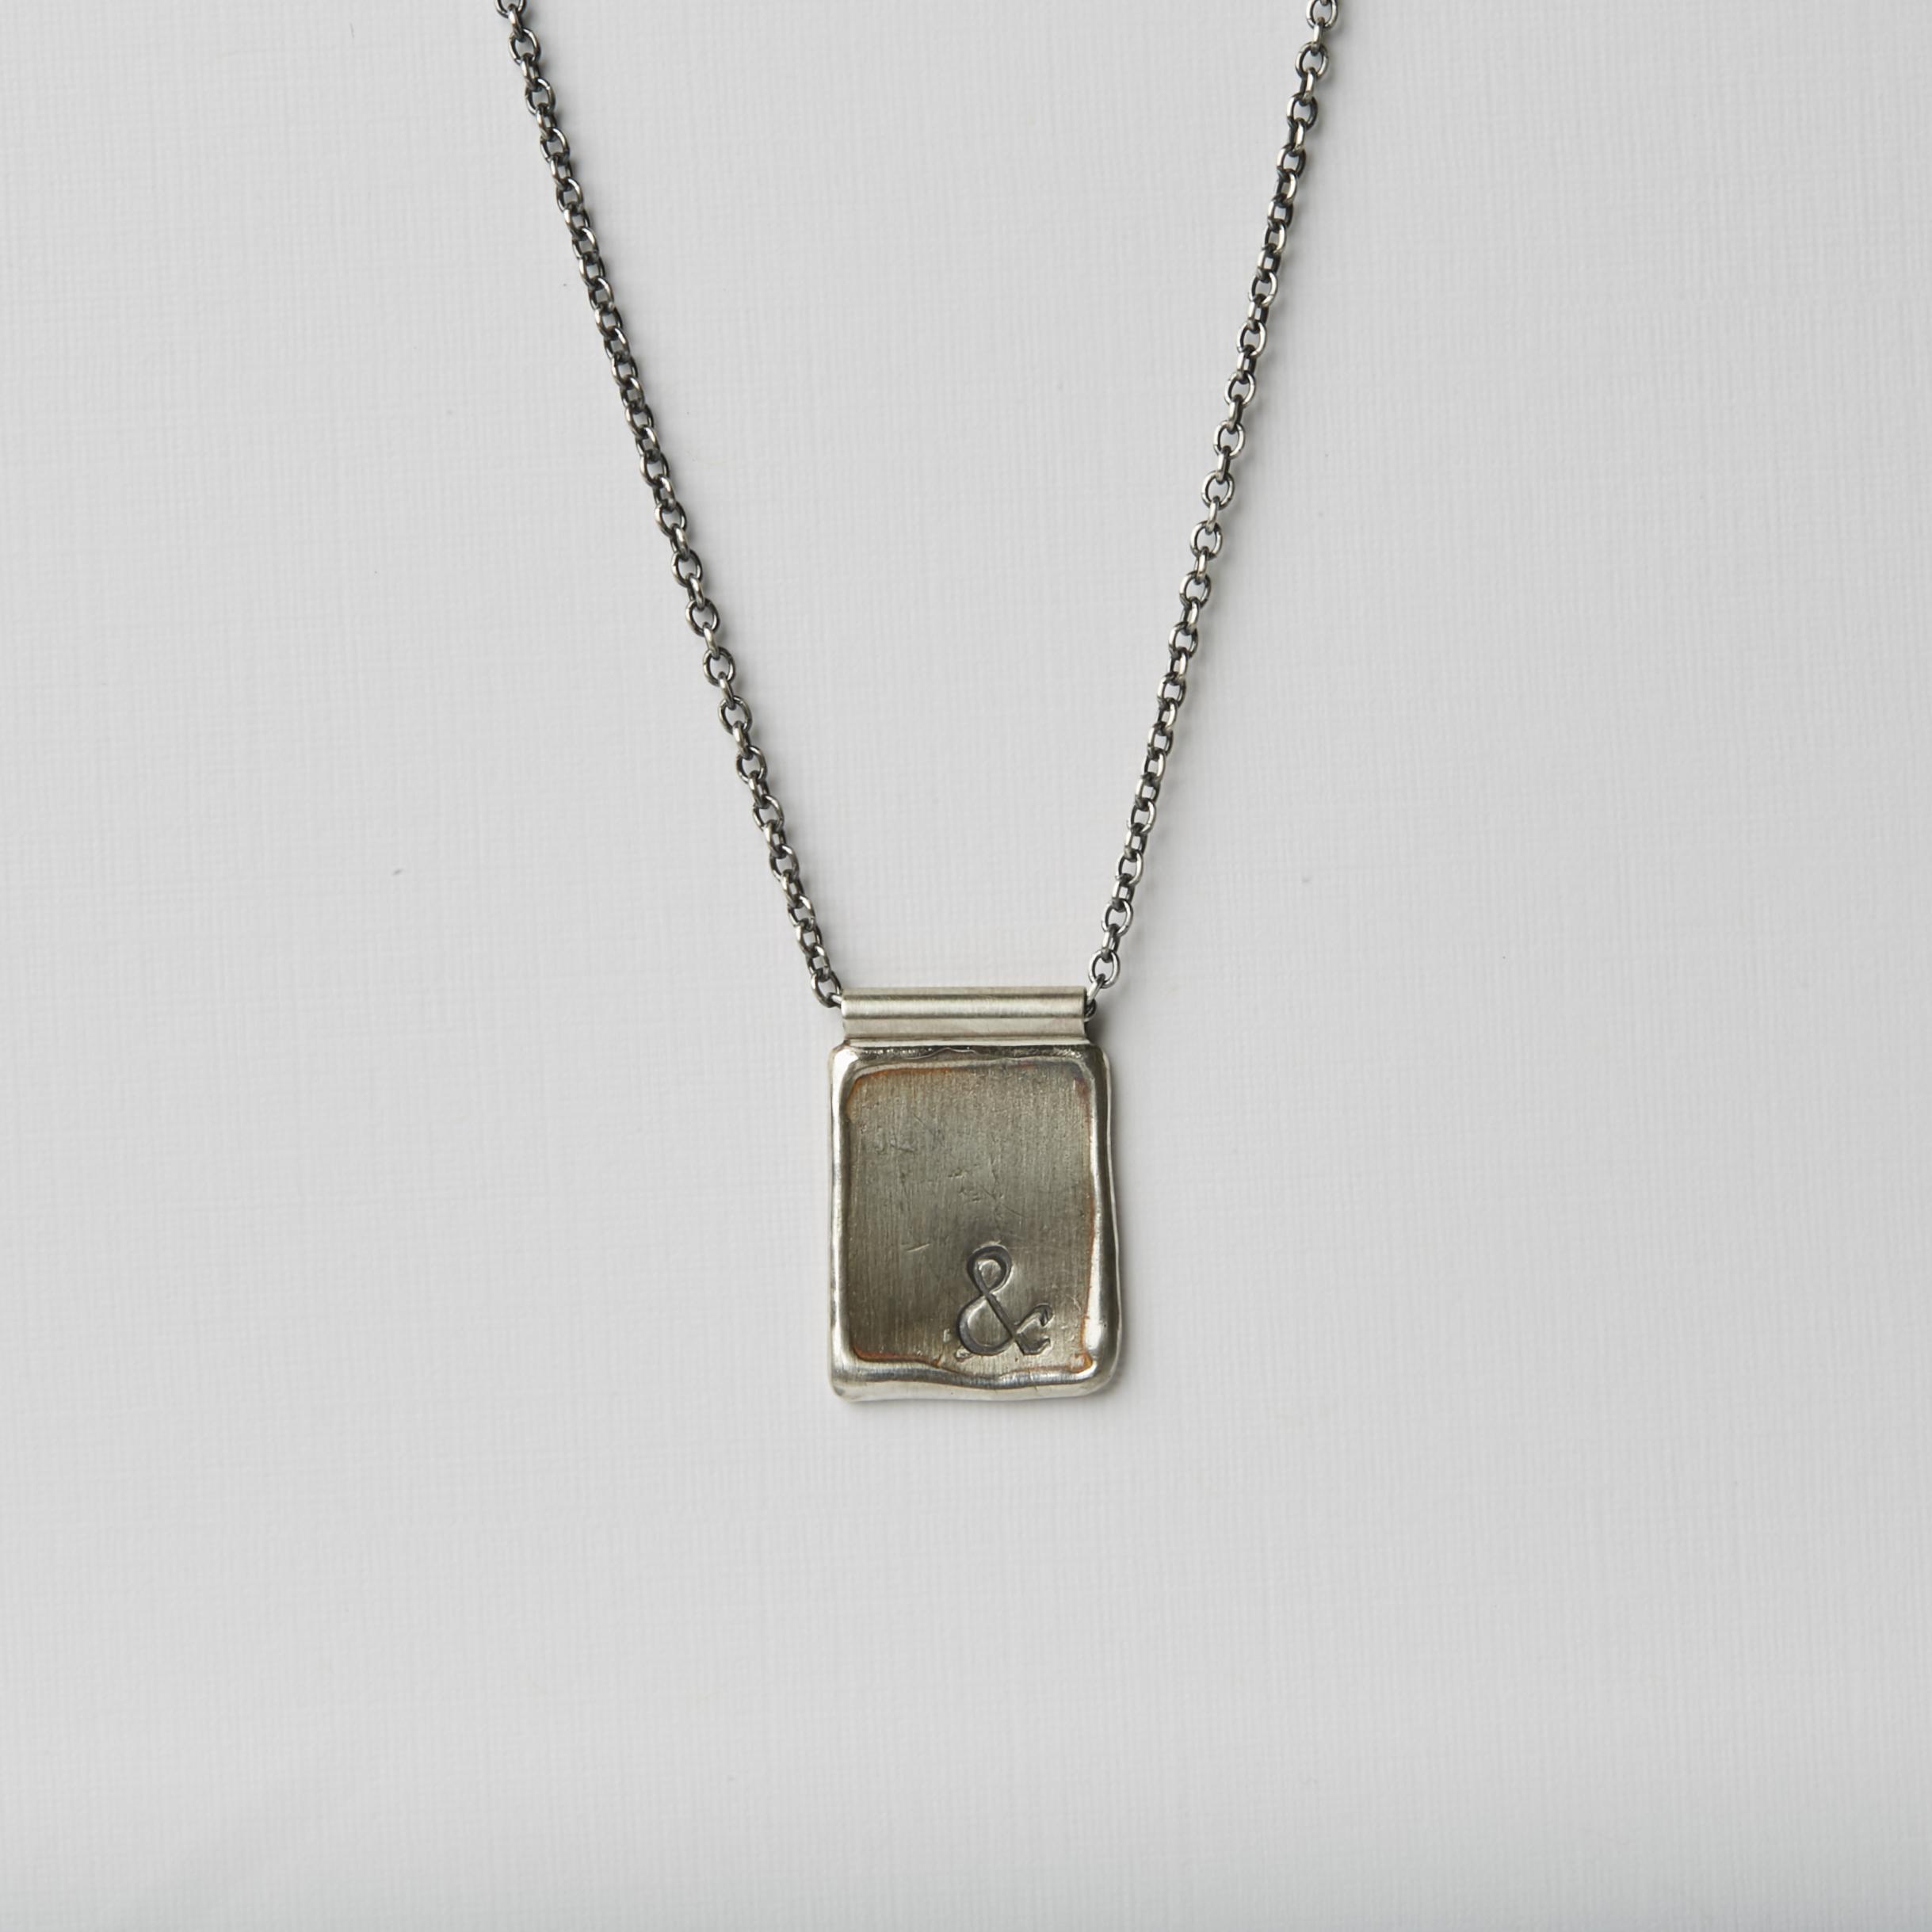 20181029_SonjaFries_Jewelry5843.jpg